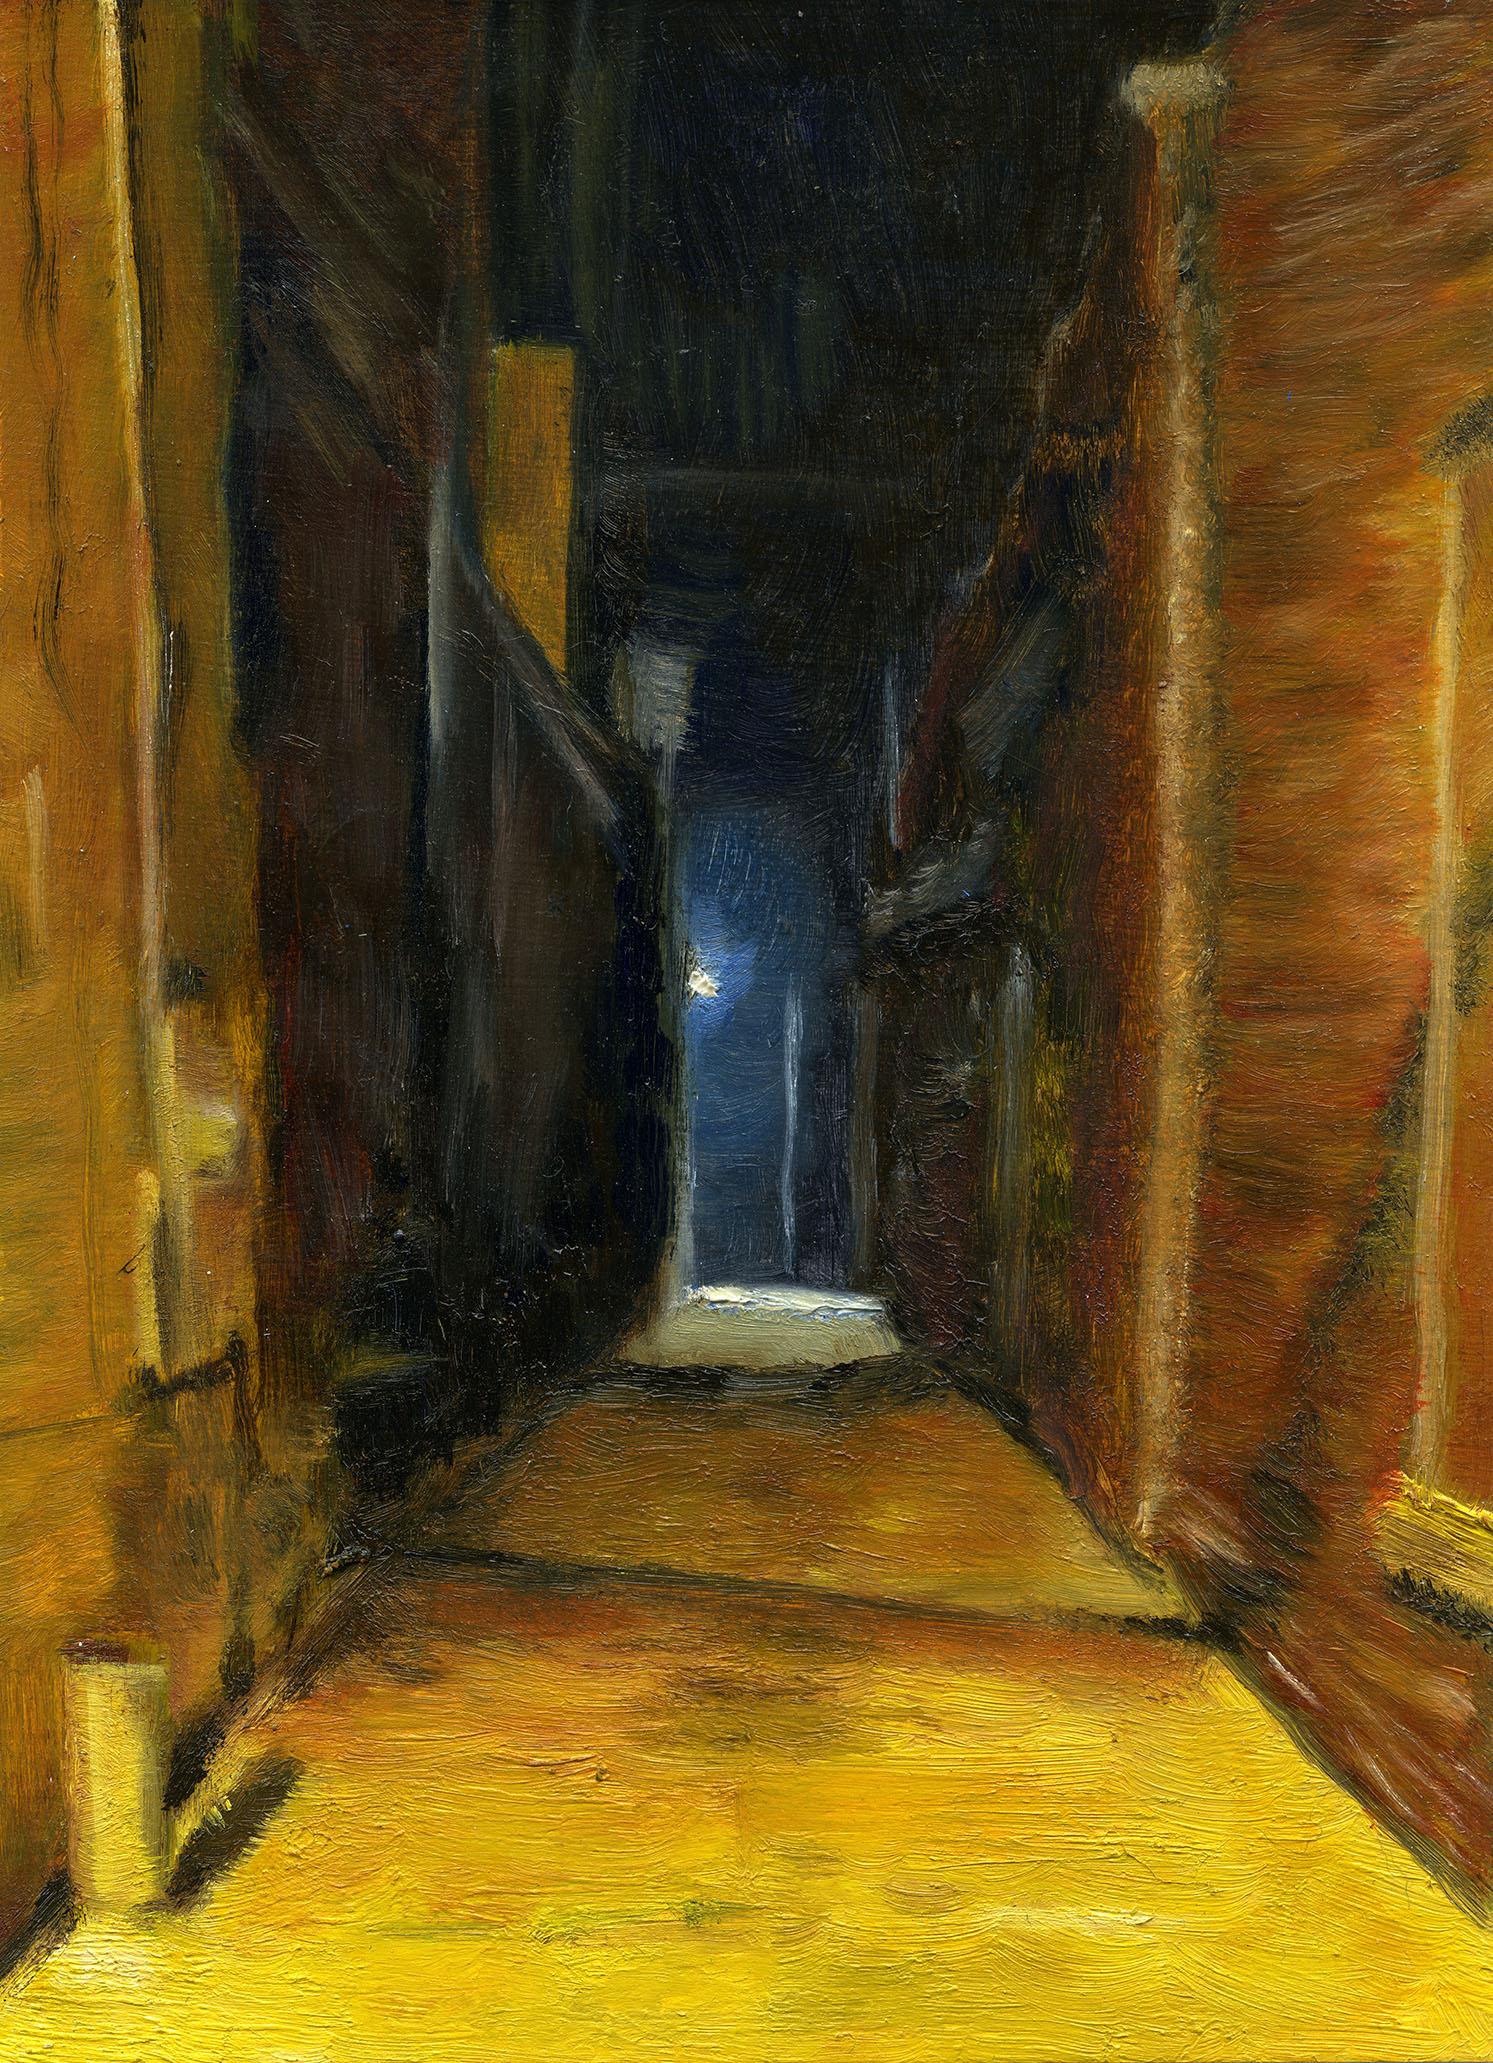 7th Street Alley